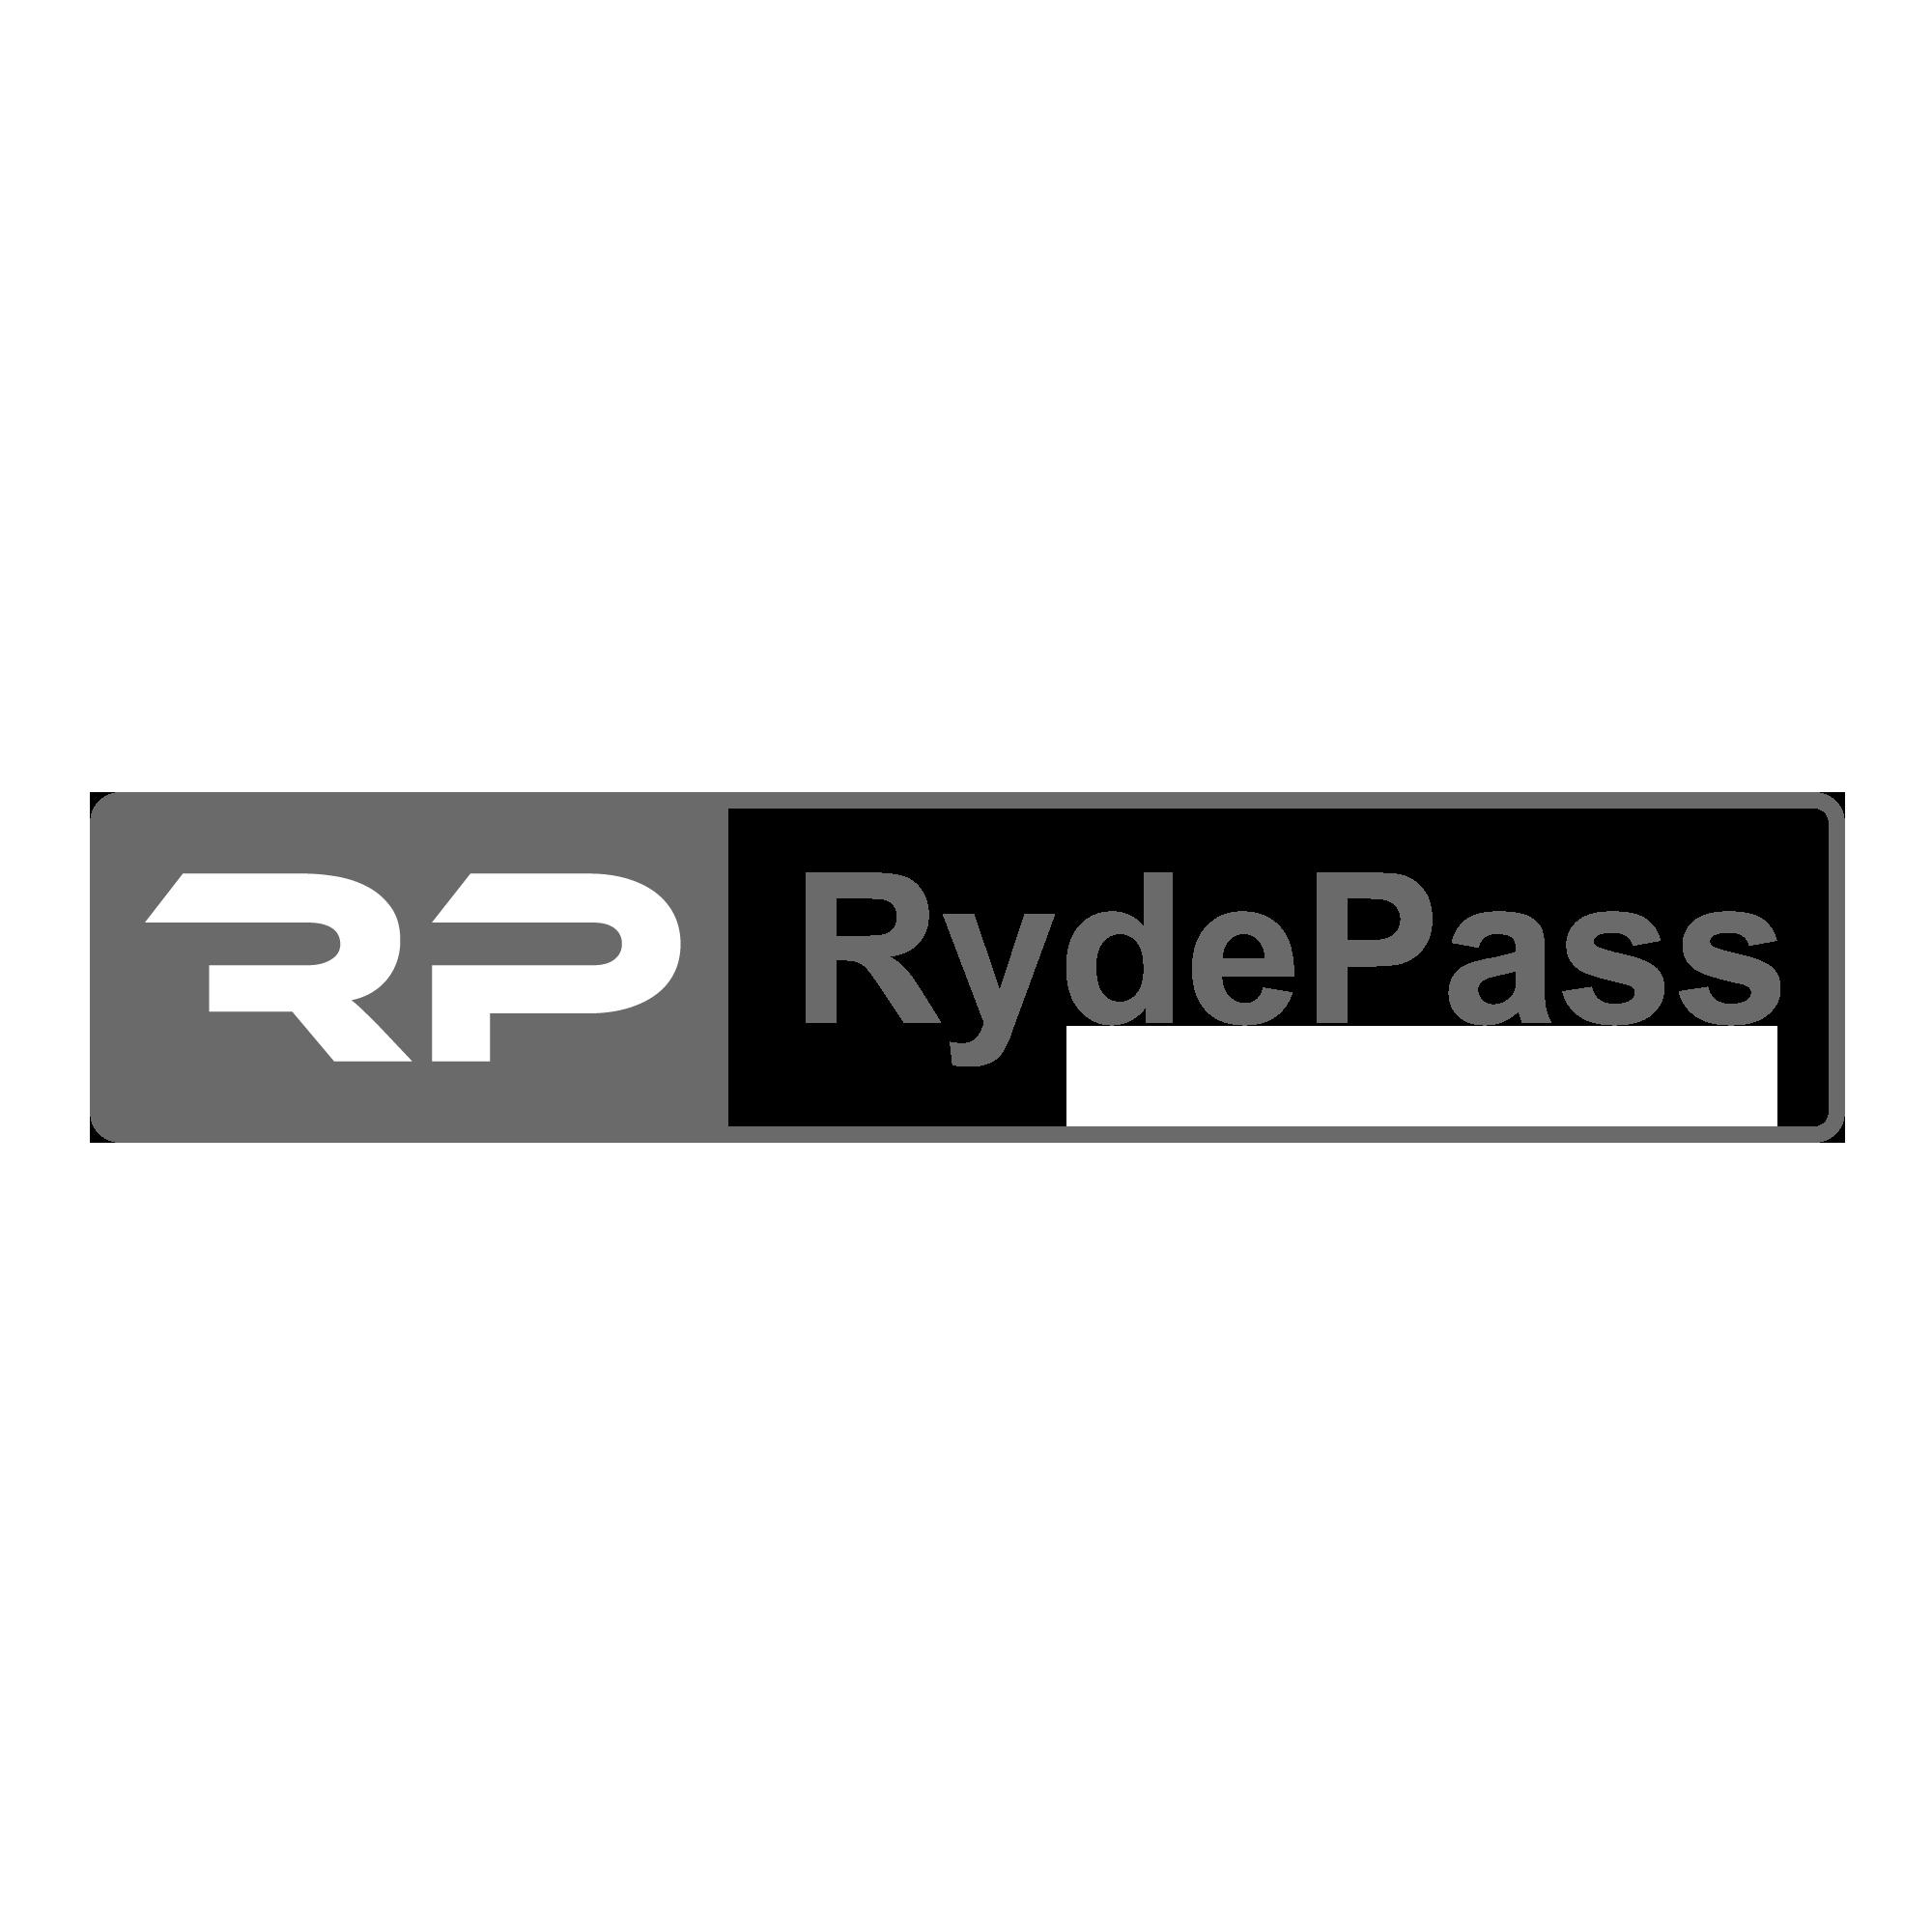 RydepassLogo.png